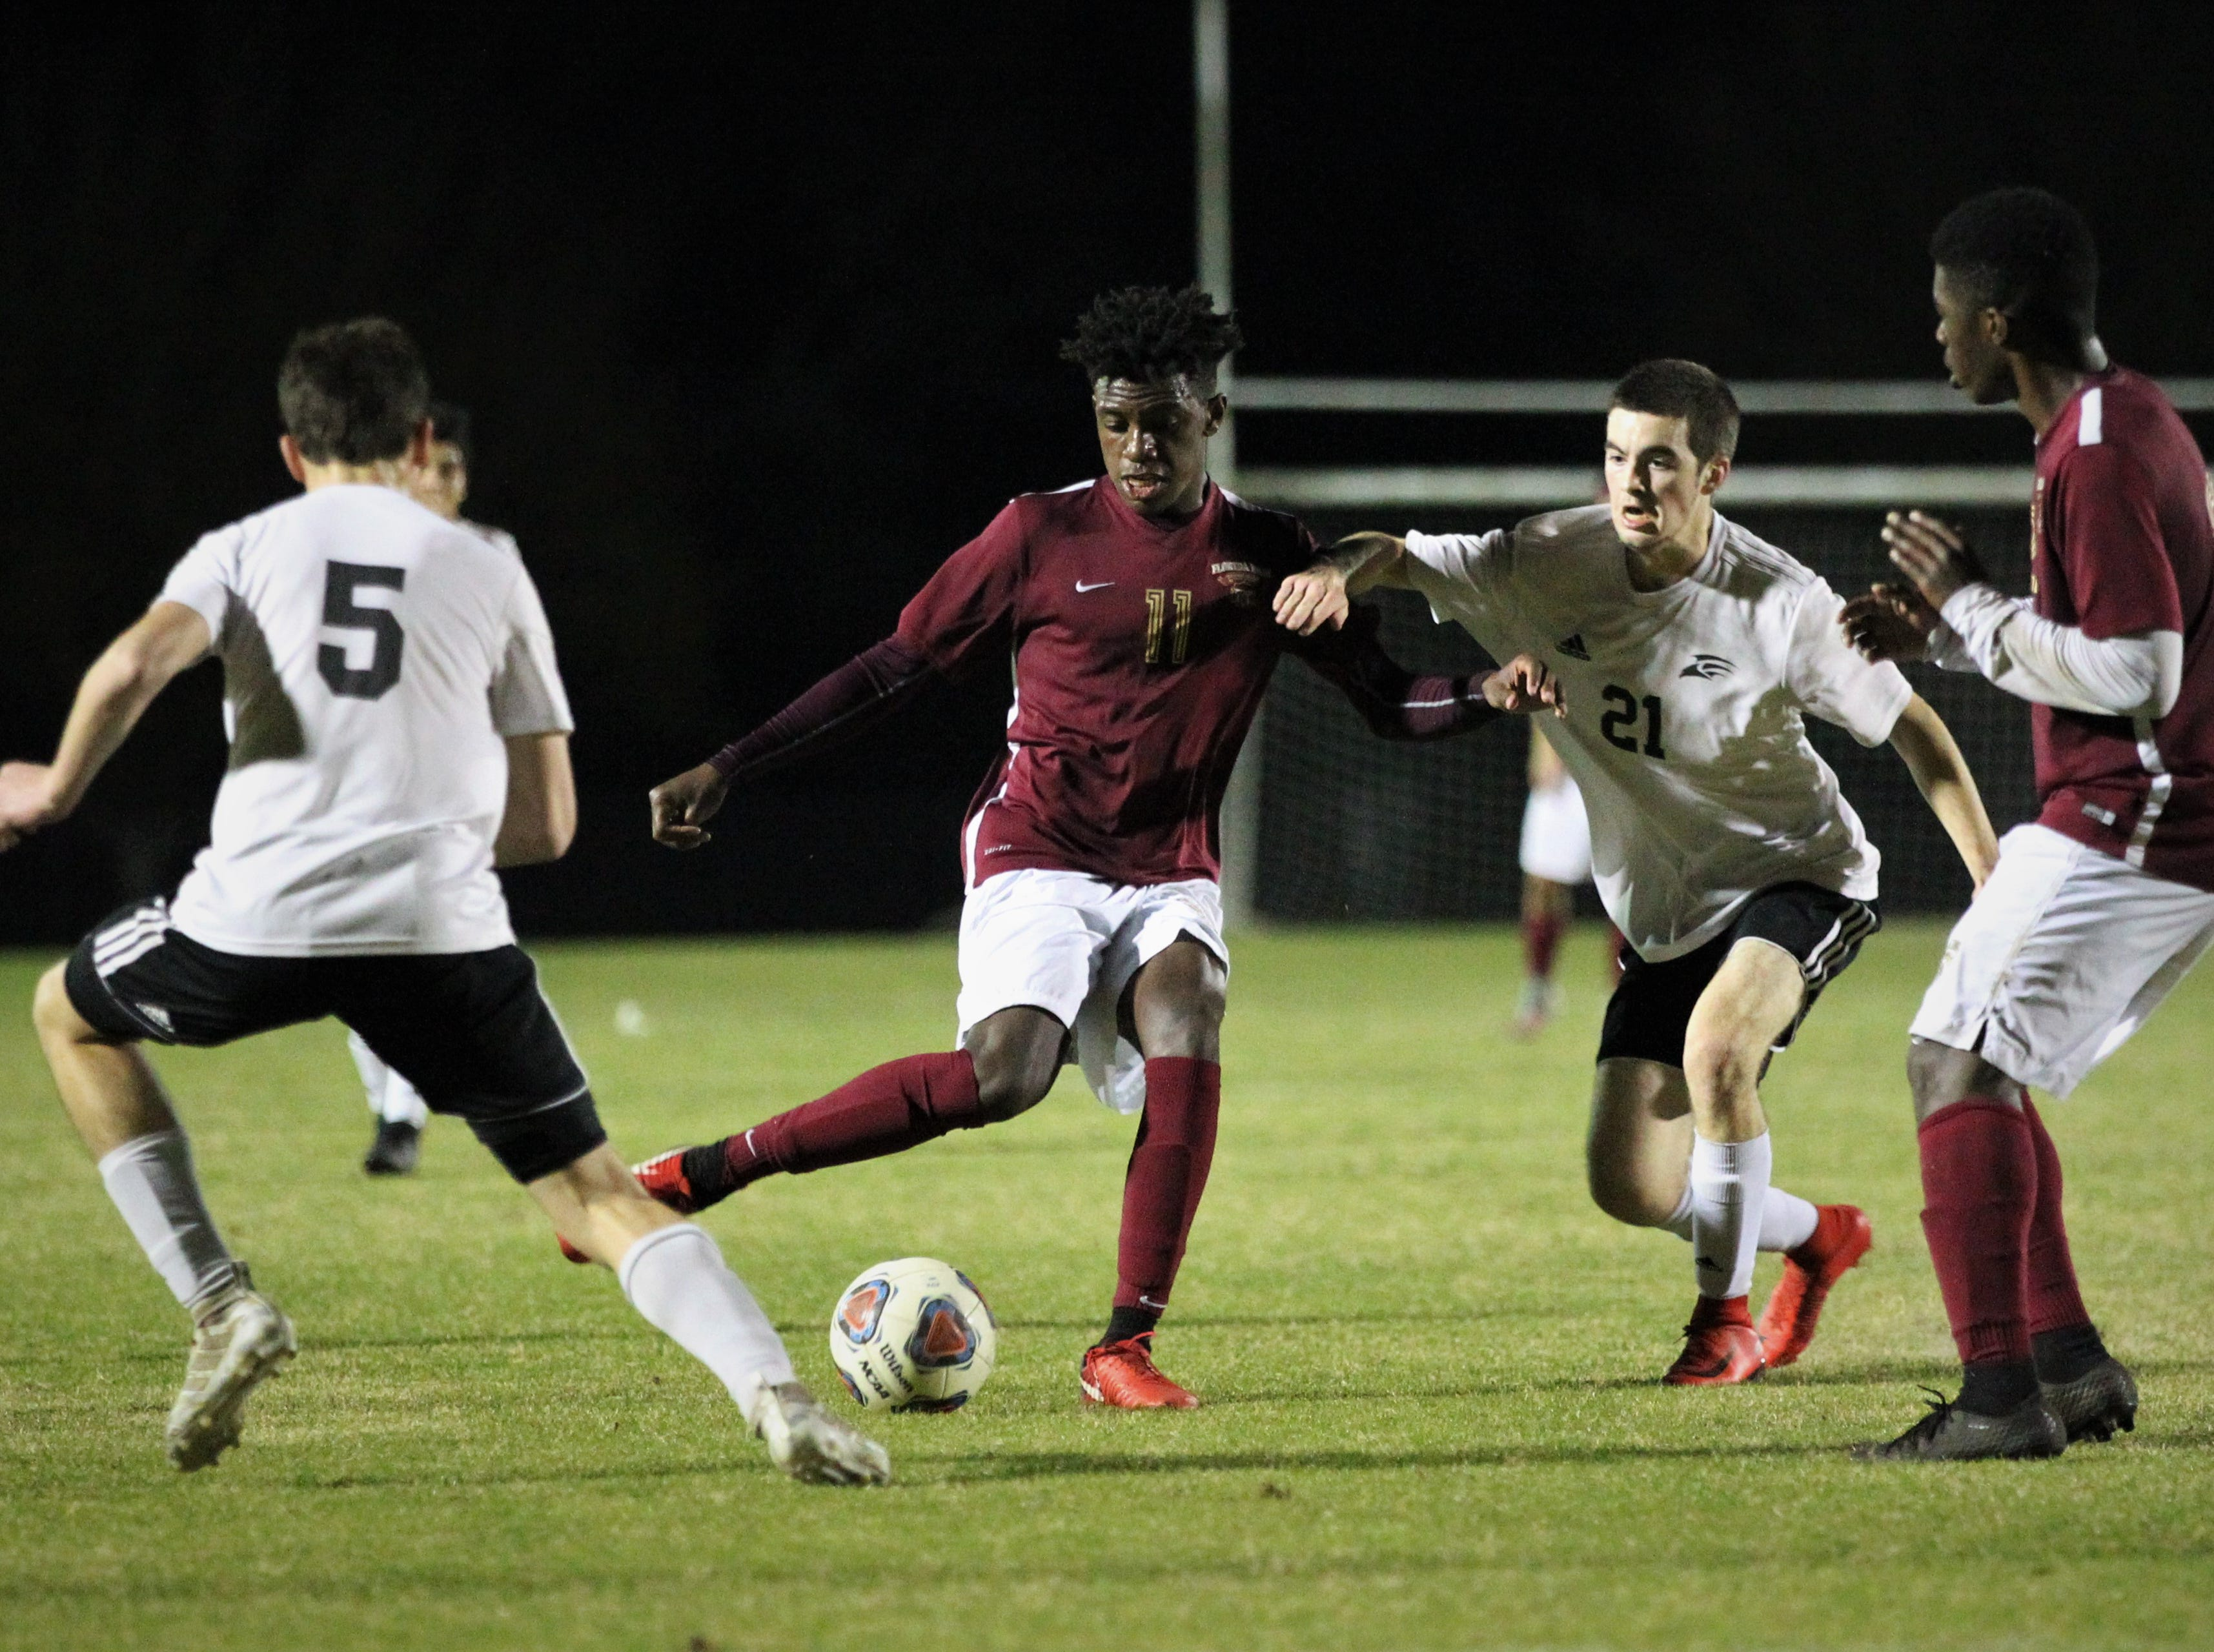 Florida High's Zuri Robertson makes a pass as Florida High's boys soccer team beat South Walton 2-0 during a Region 1-2A quarterfinal on Feb. 6, 2018.